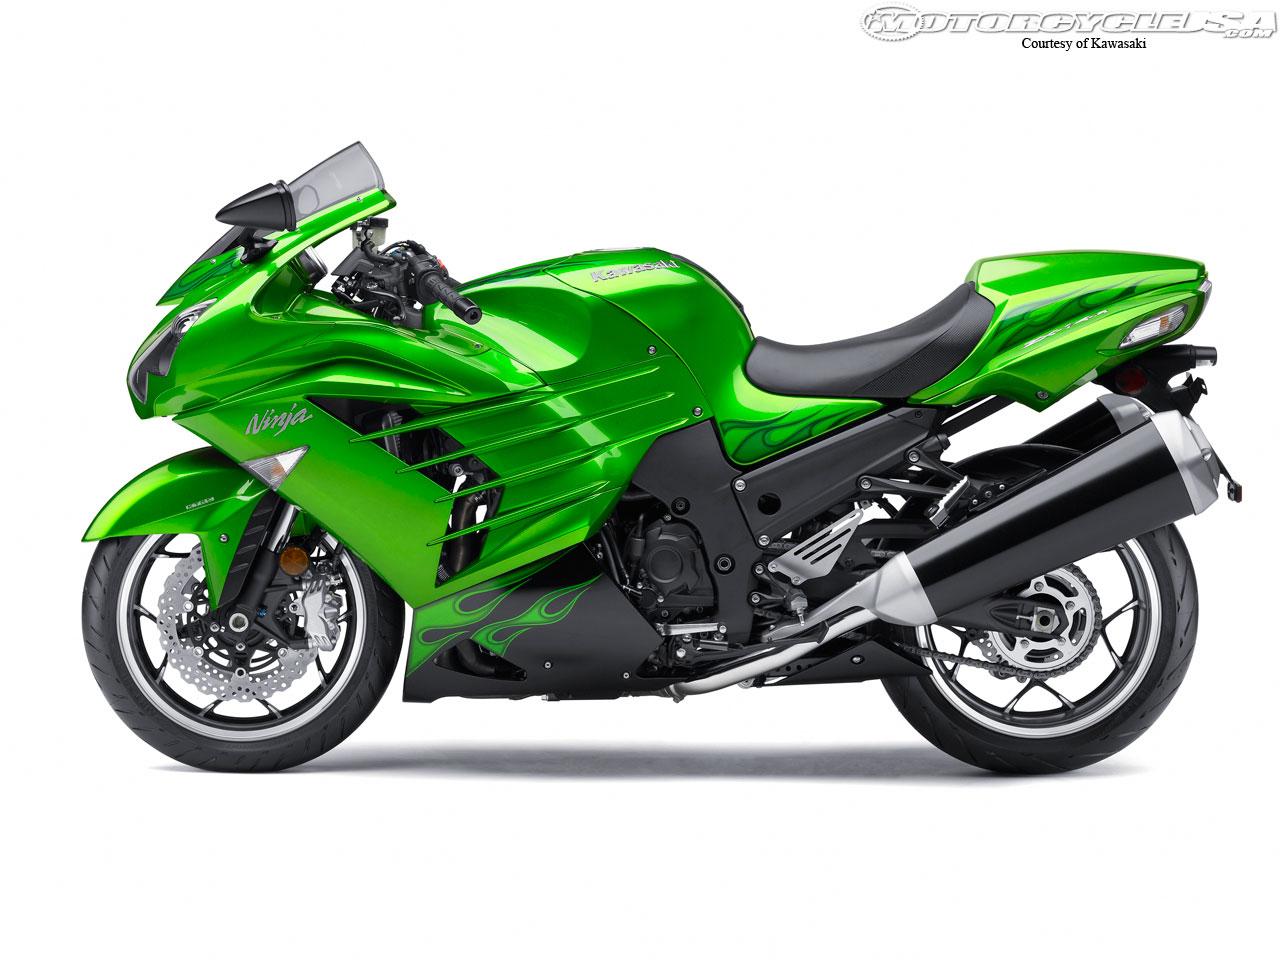 Kawasaki Ninja Zx14 Ride Beastteaser as well ZX 14R 2012 moreover Zx636 240 S A Kit further Watch further Ggrr. on 2011 kawasaki zx14